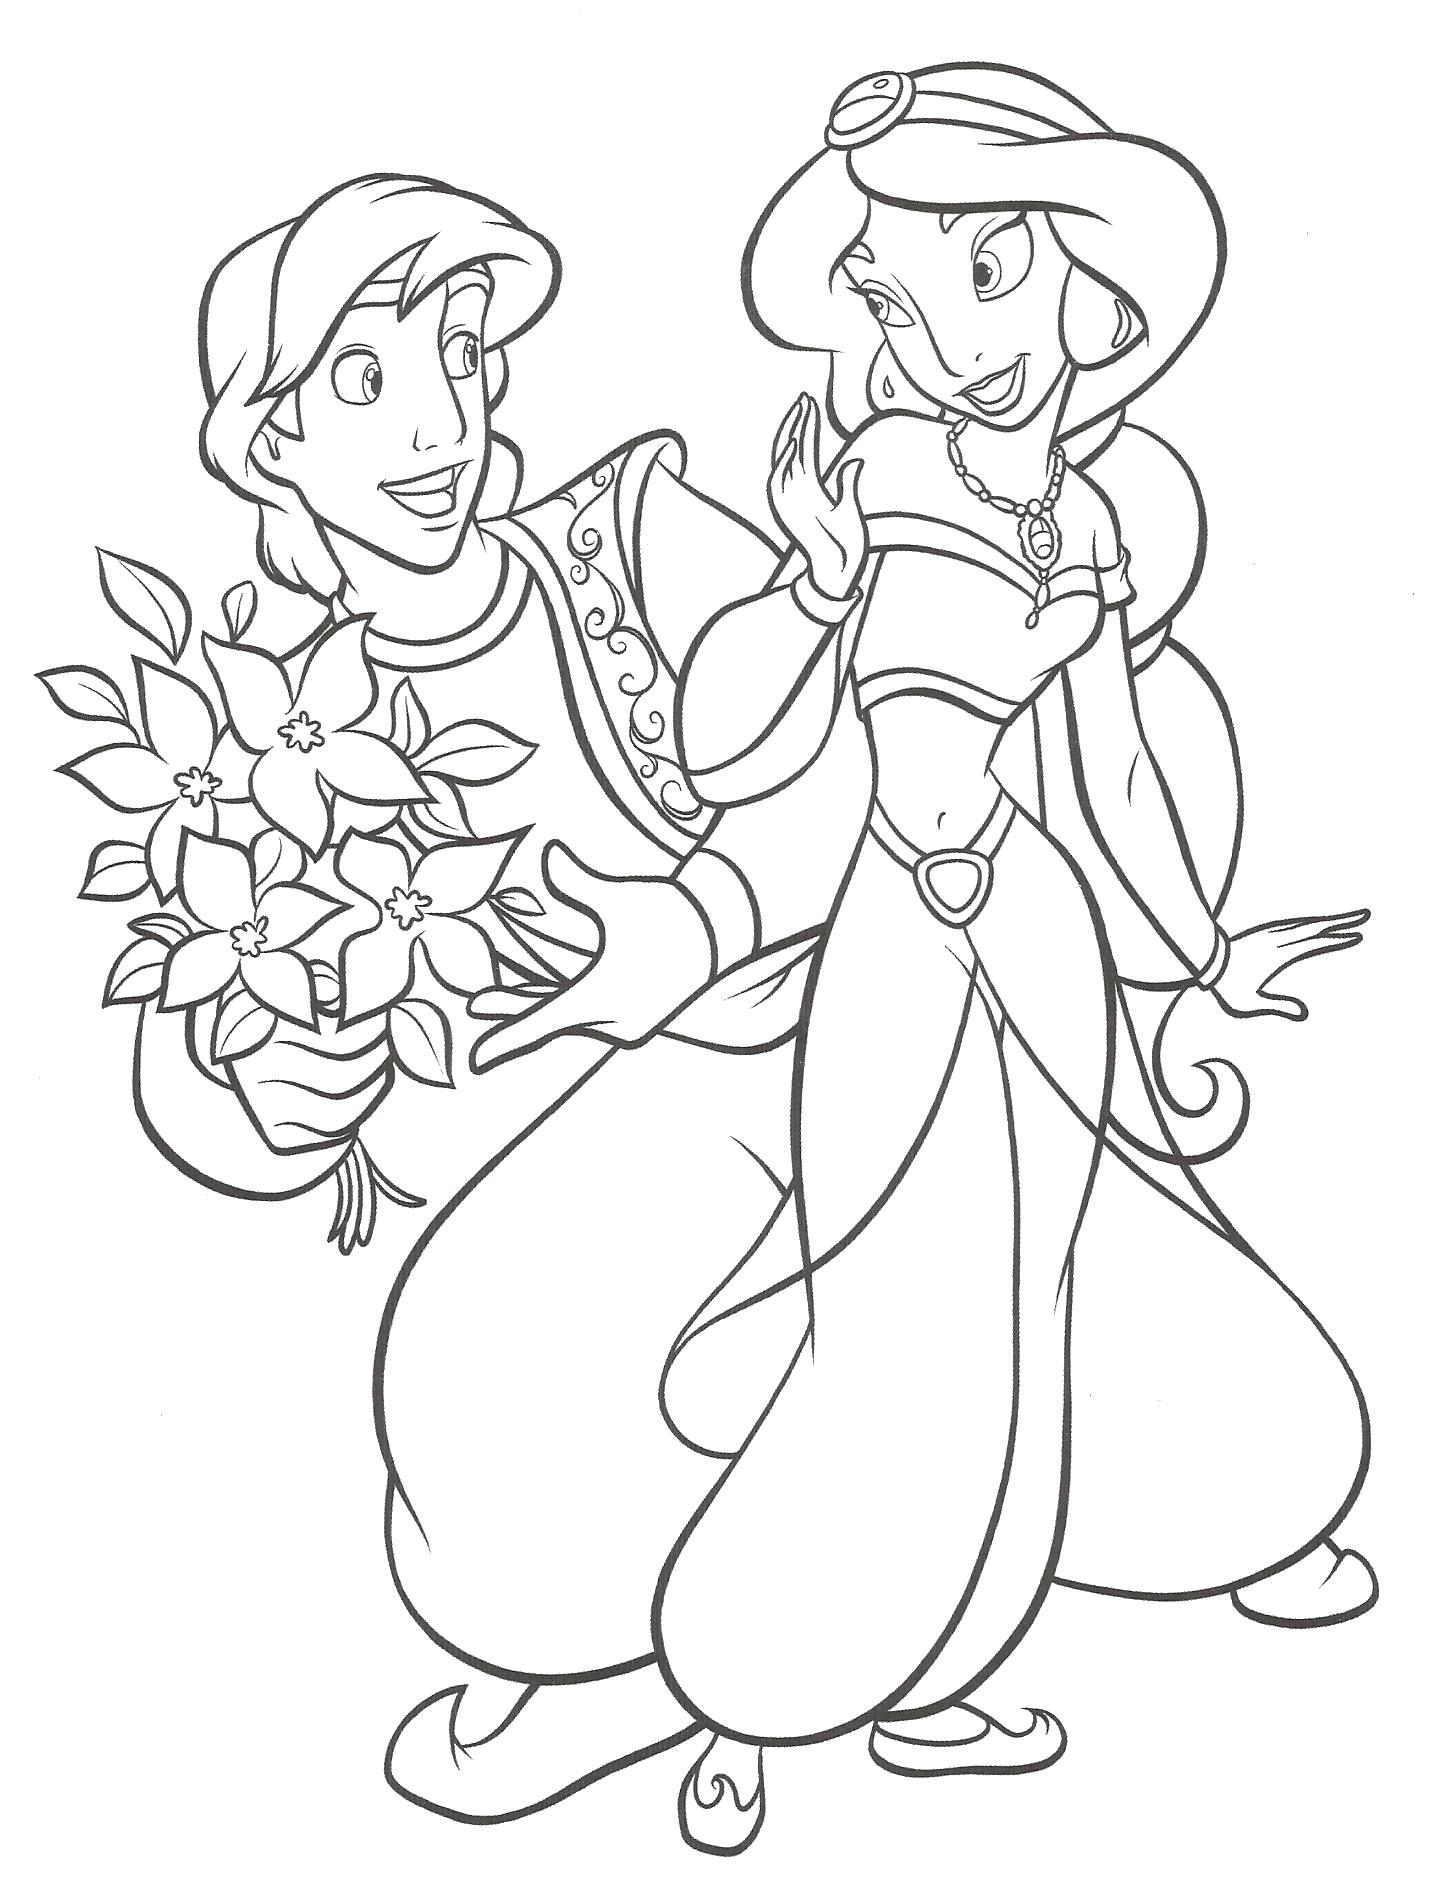 coloriage aladdin et jasmine en ligne